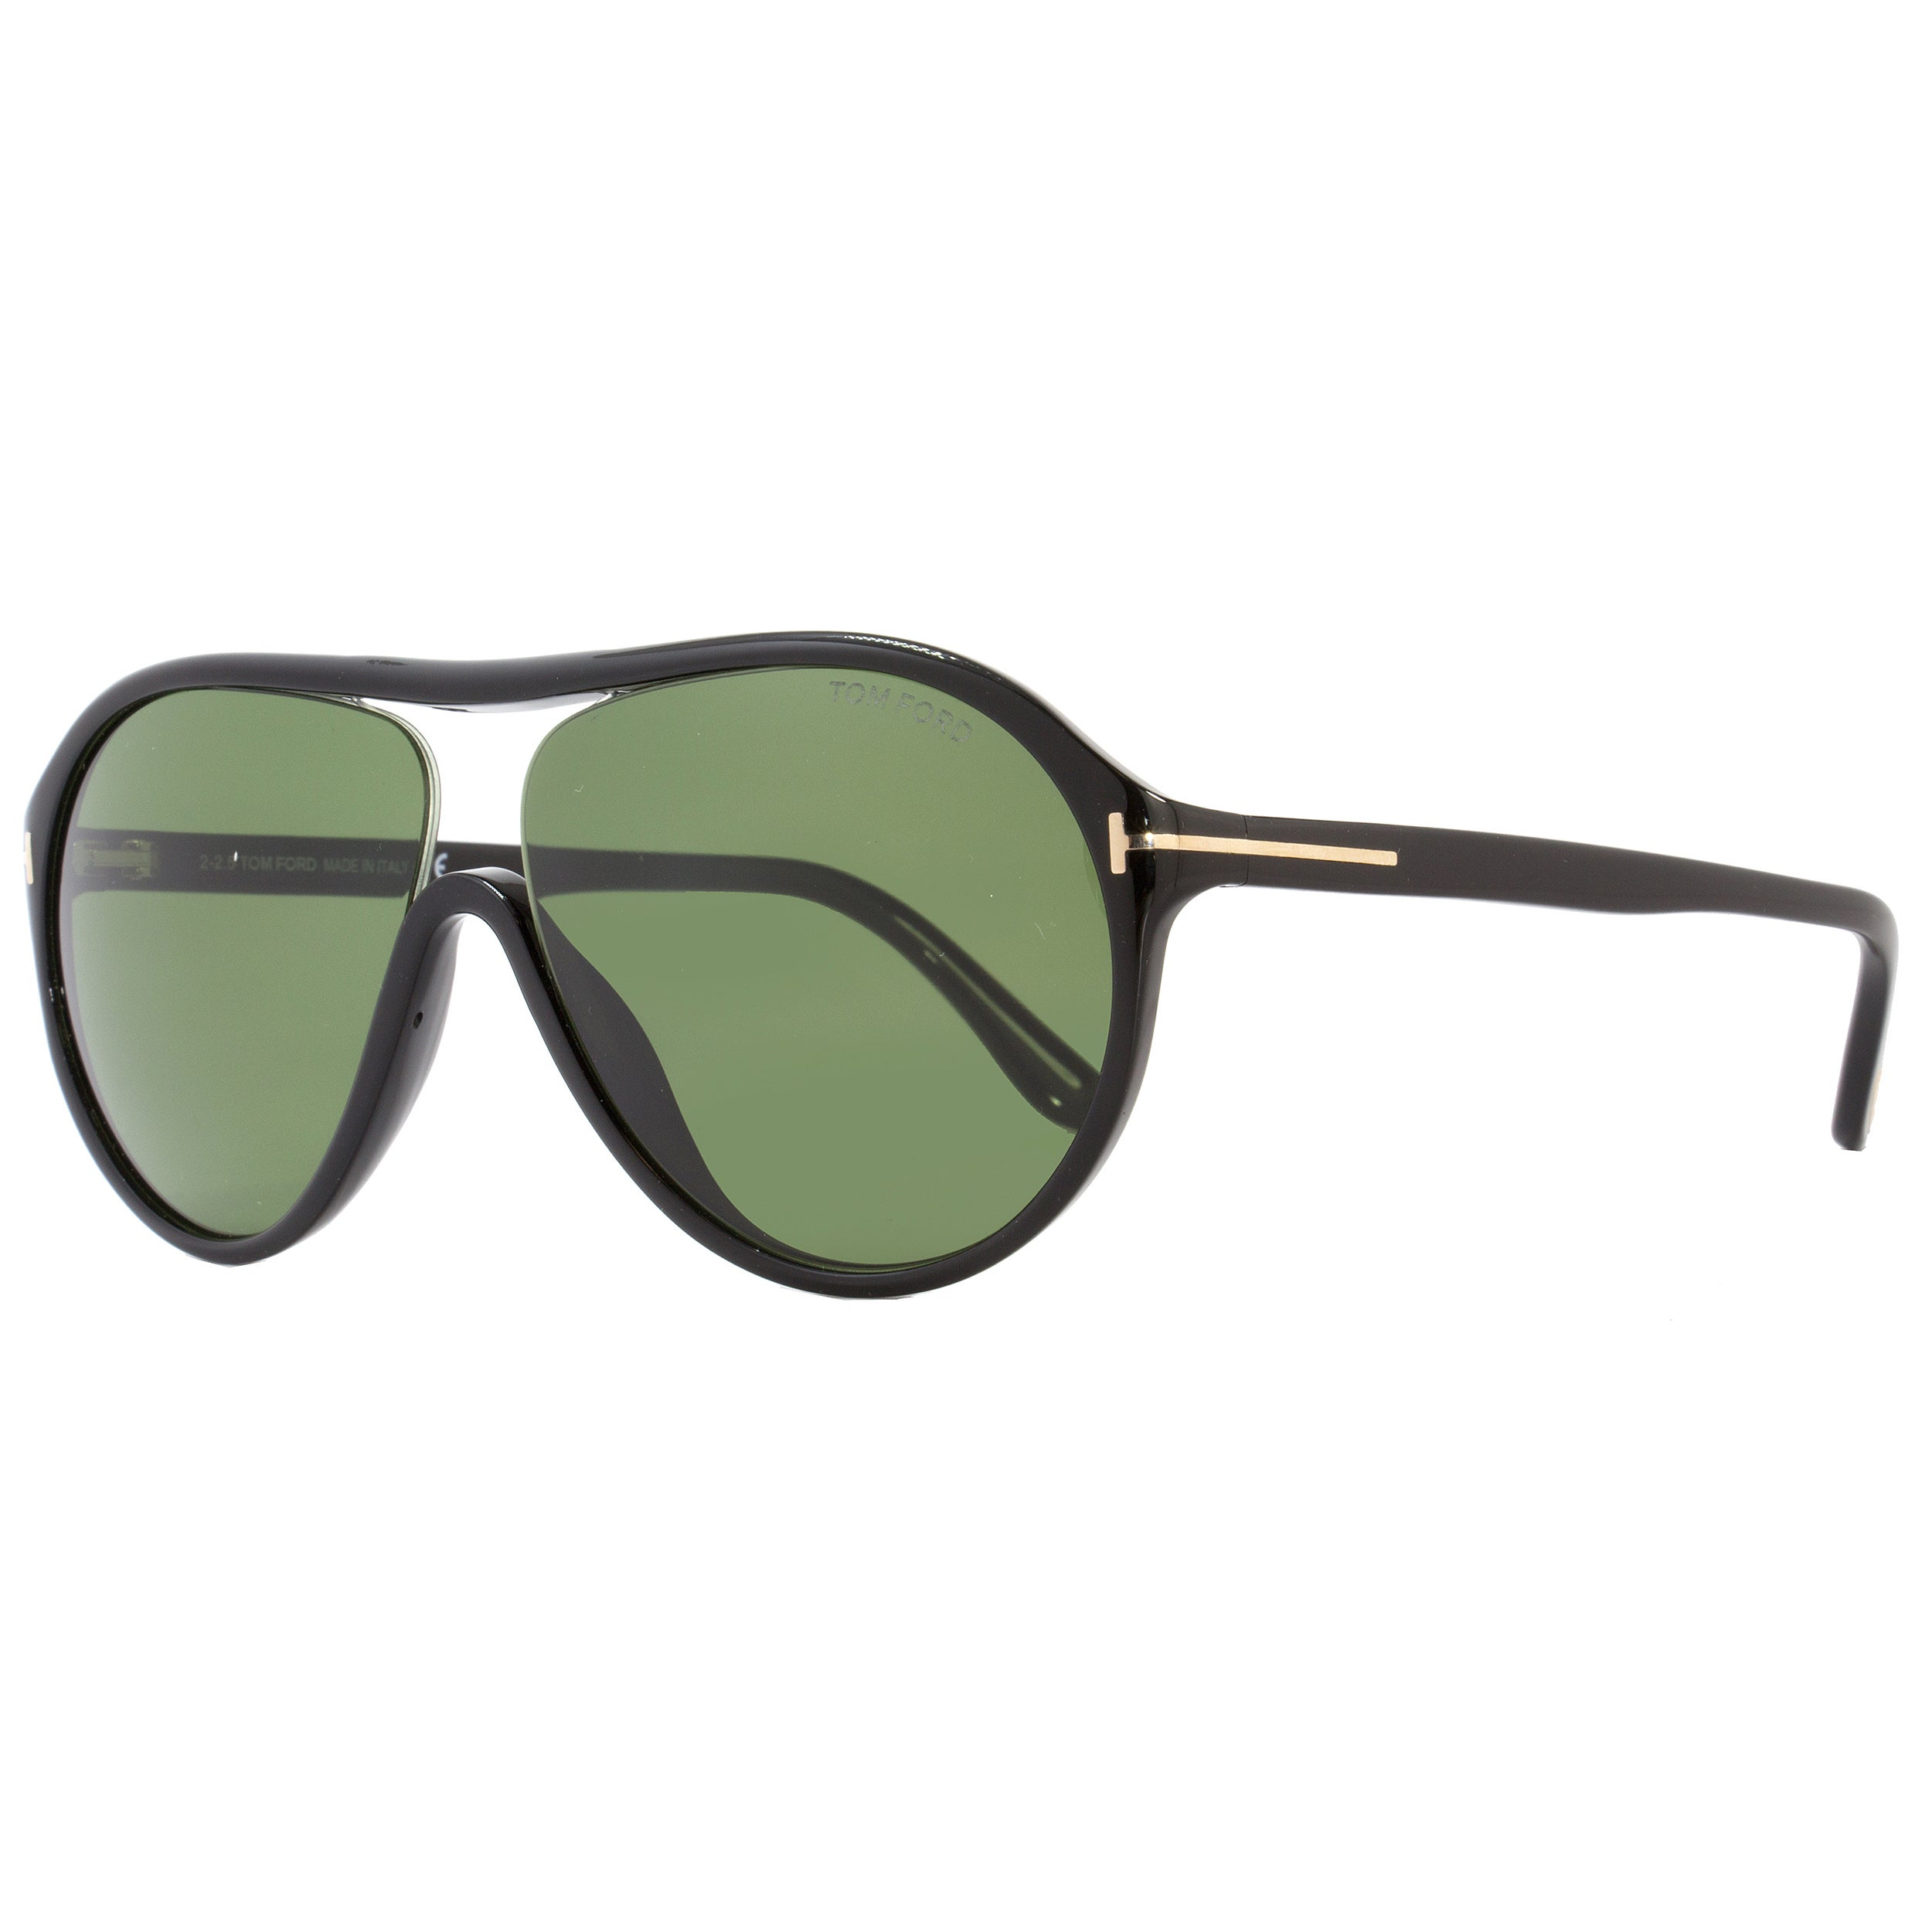 51a6d049f88 Tom Ford TF443 Edison 01N Women s Black Green Lens Sunglasses